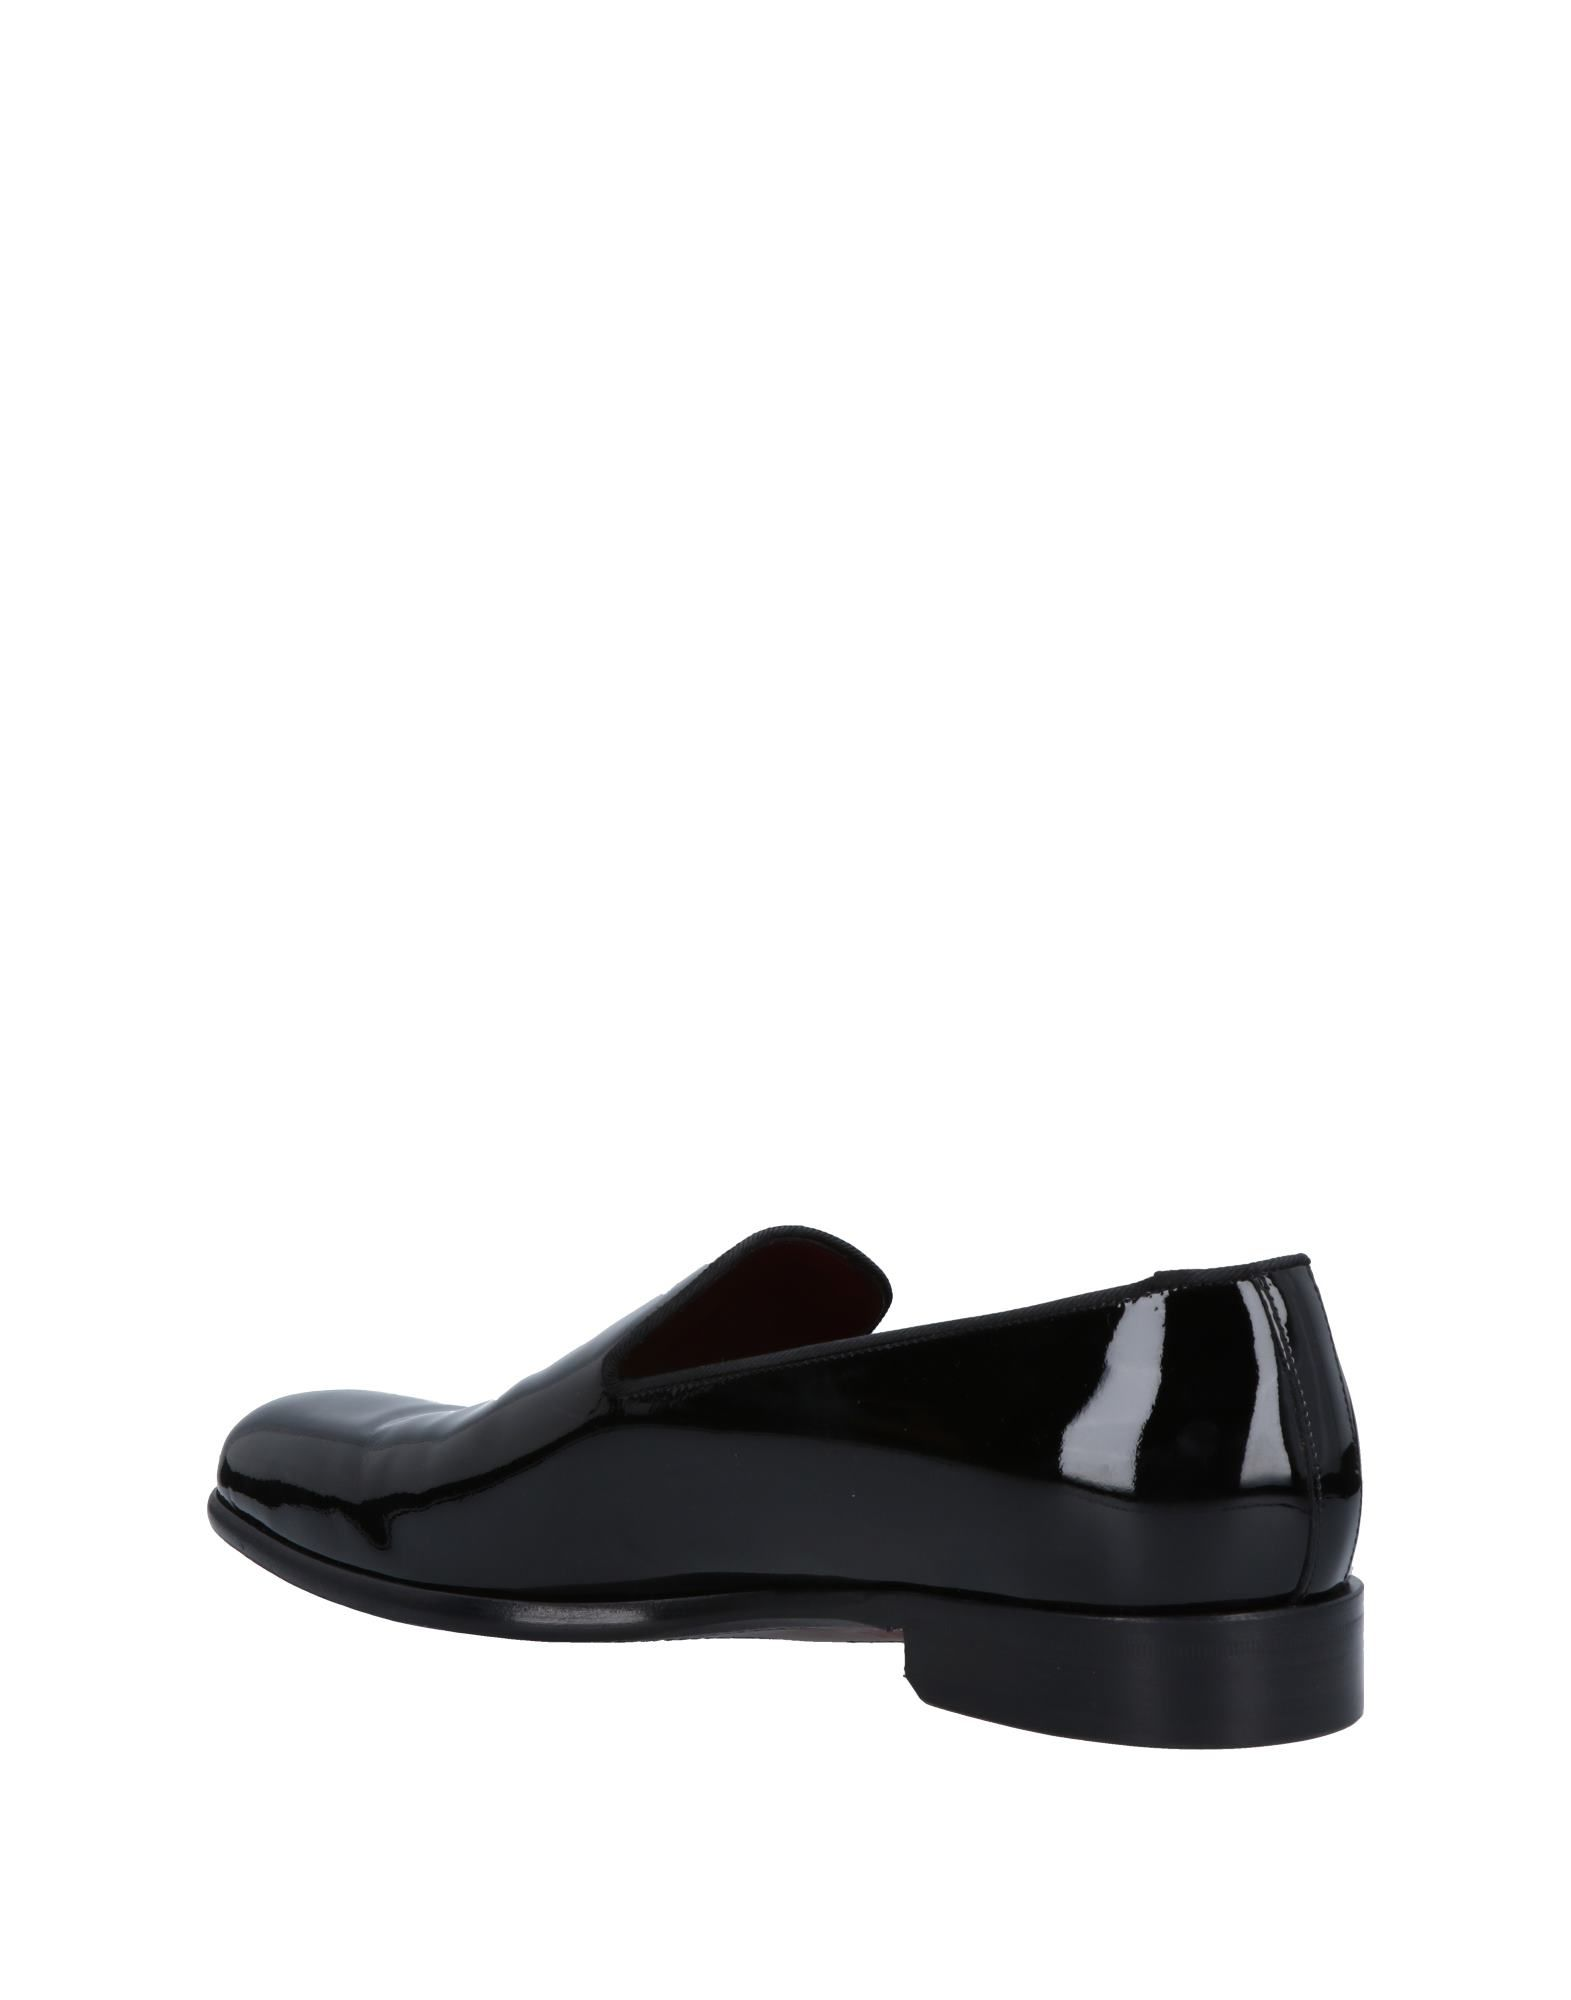 Dolce & Gabbana Loafers - - - Men Dolce & Gabbana Loafers online on  United Kingdom - 11487314XQ 0e0ef3